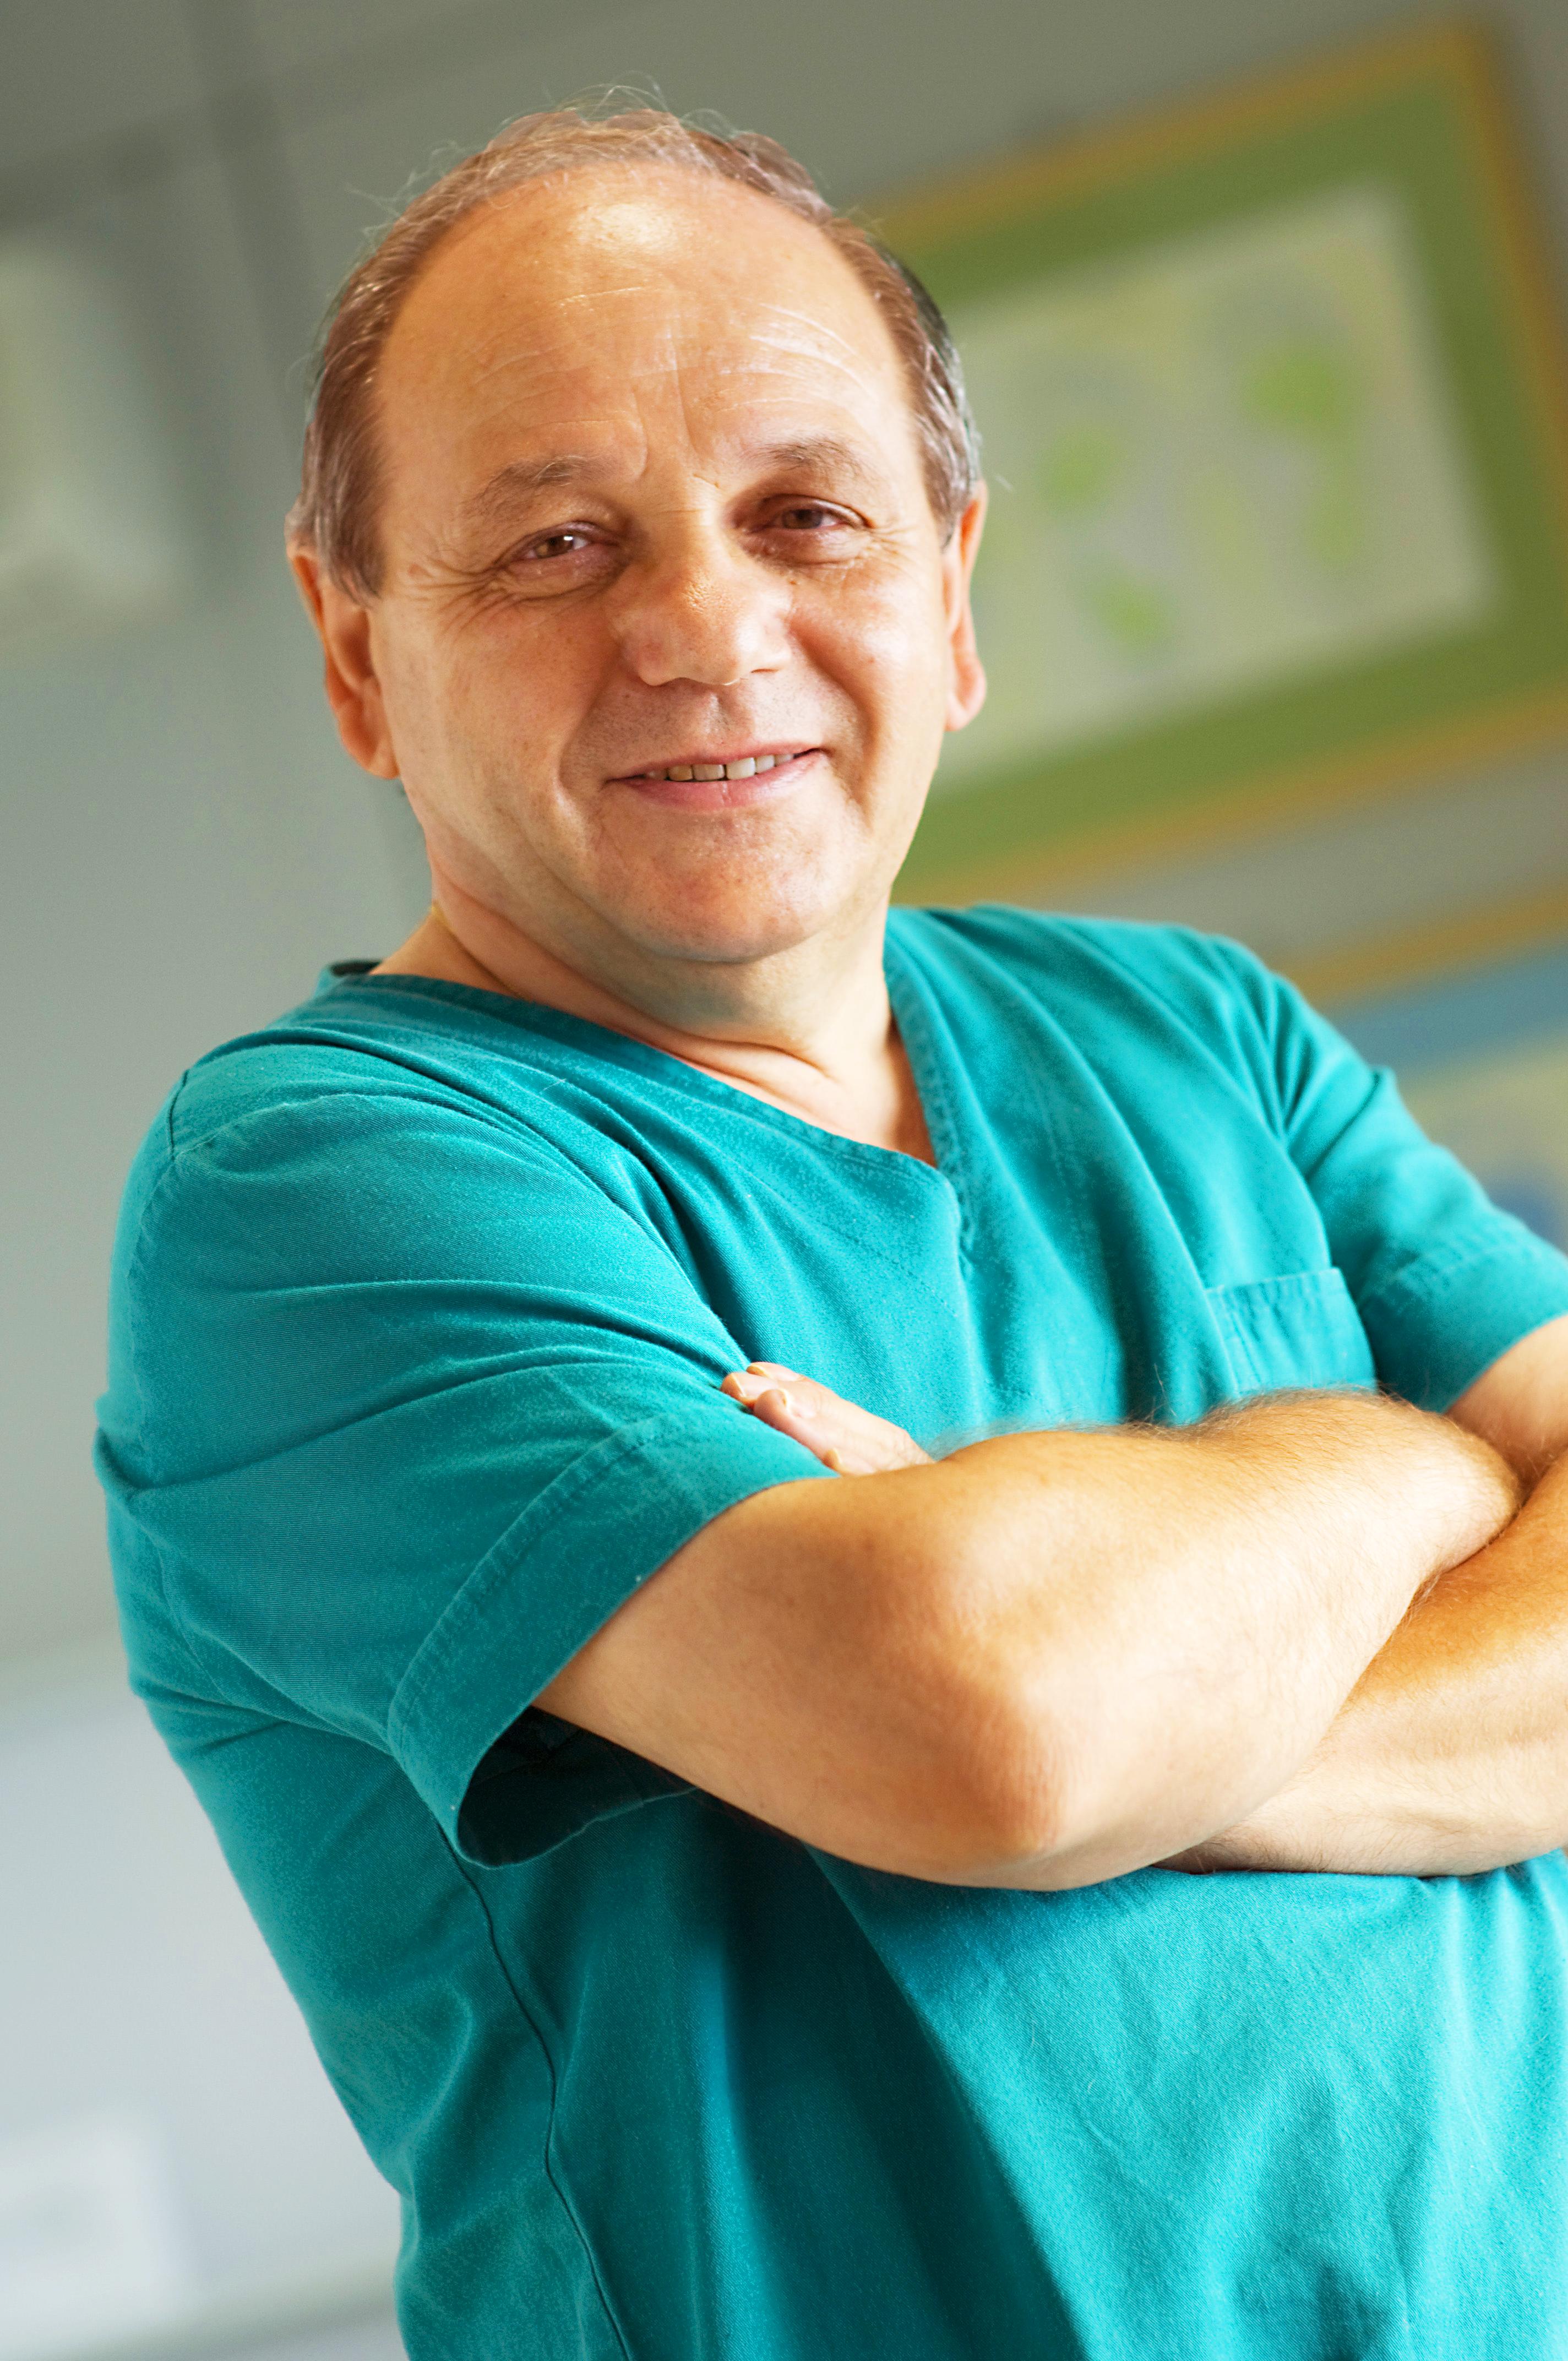 Dott. Valerio Orlandi